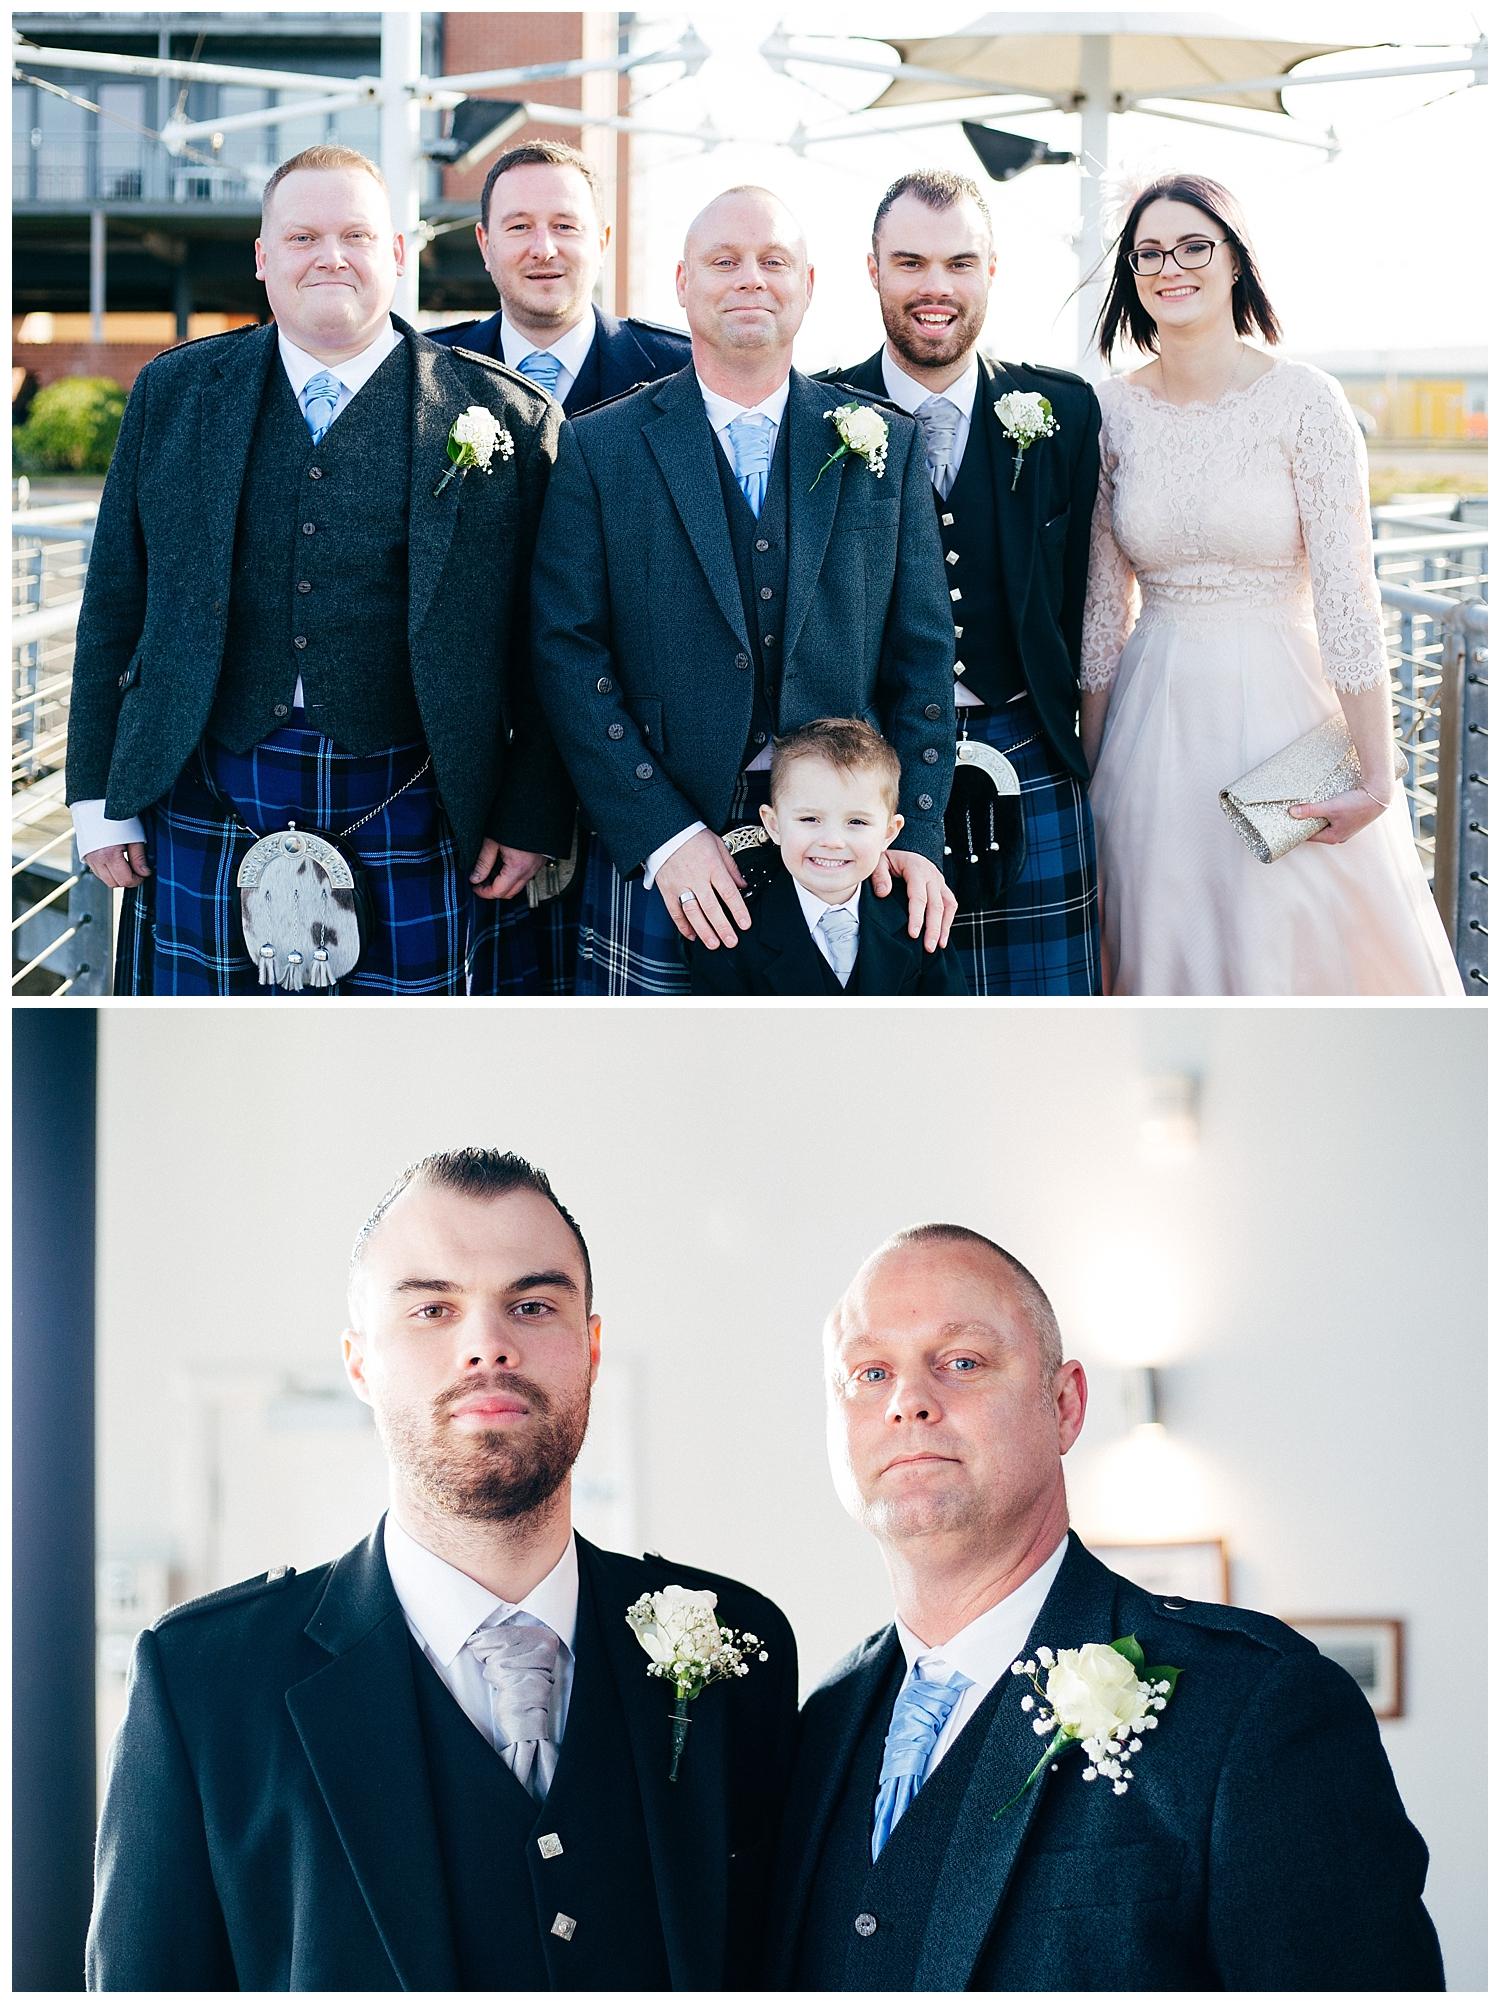 Kirsty_Brown_Wedding_Photography_0006.jpg